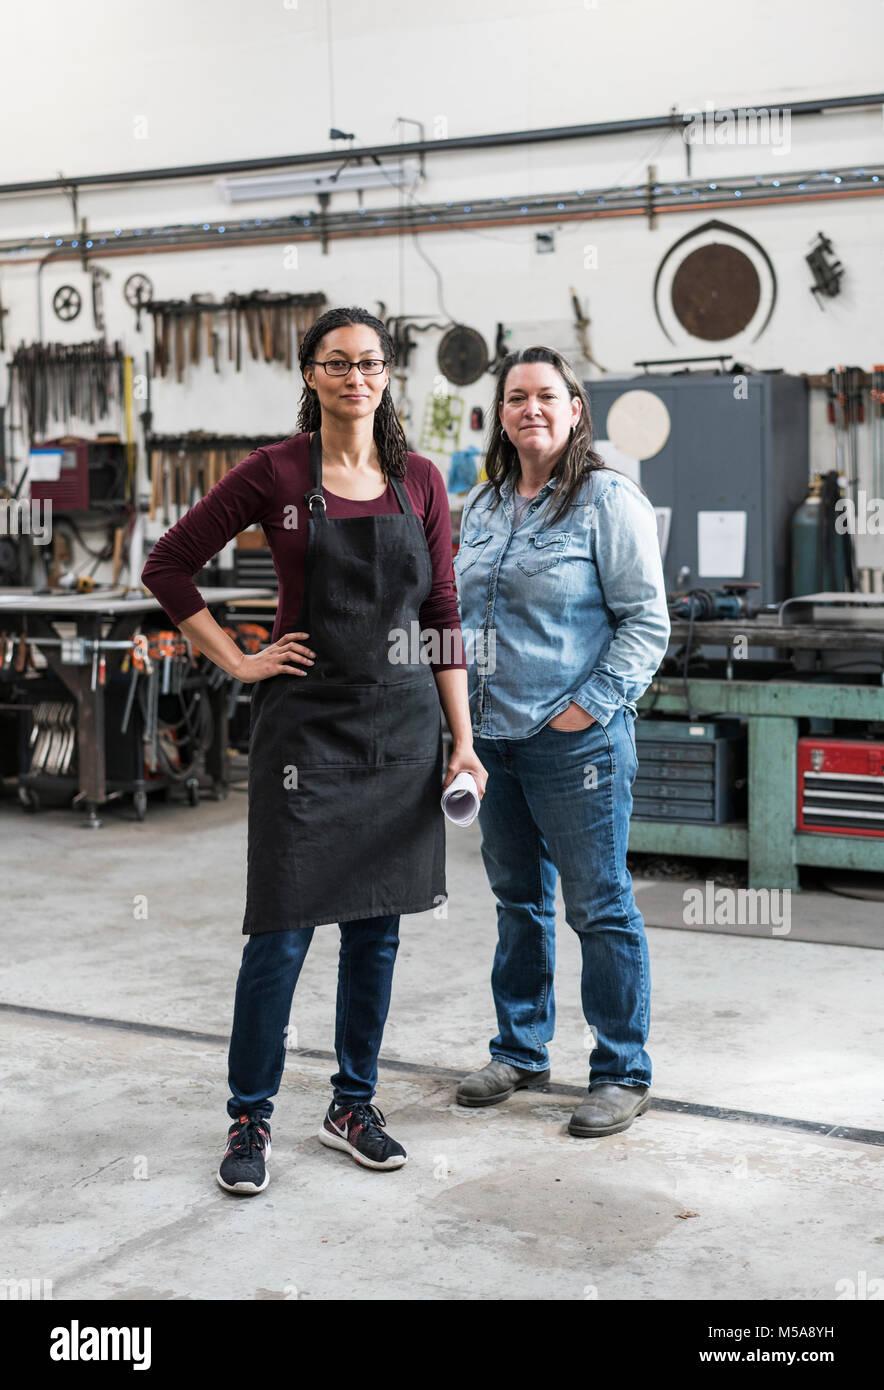 Two women wearing apron and Denim shirt standing in metal workshop, smiling at camera. - Stock Image